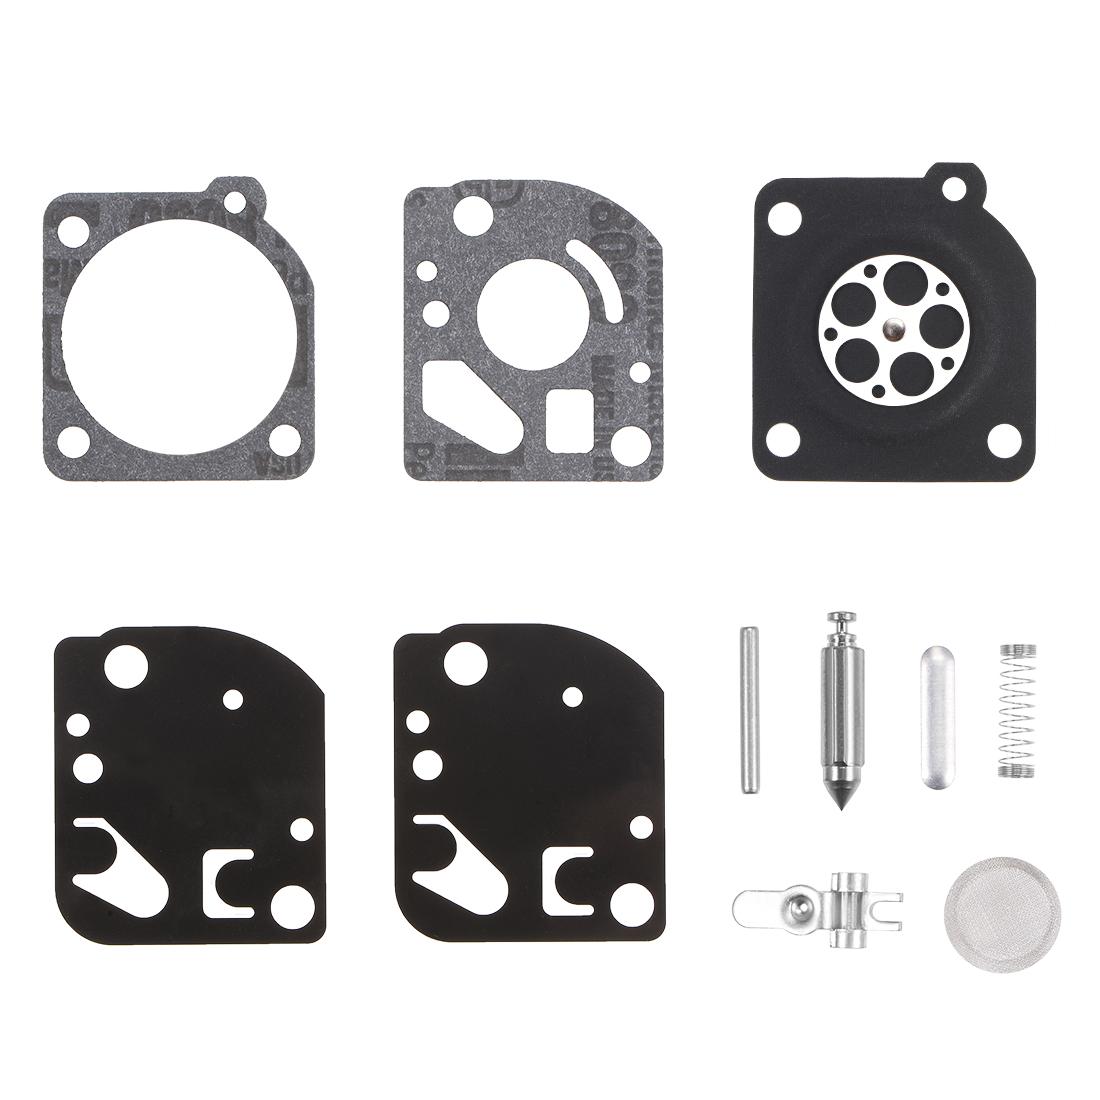 Carburetor Rebuild Kit Gasket Diaphragm RB-21 for ECHO GT1100 2100 PB 1000 3pcs